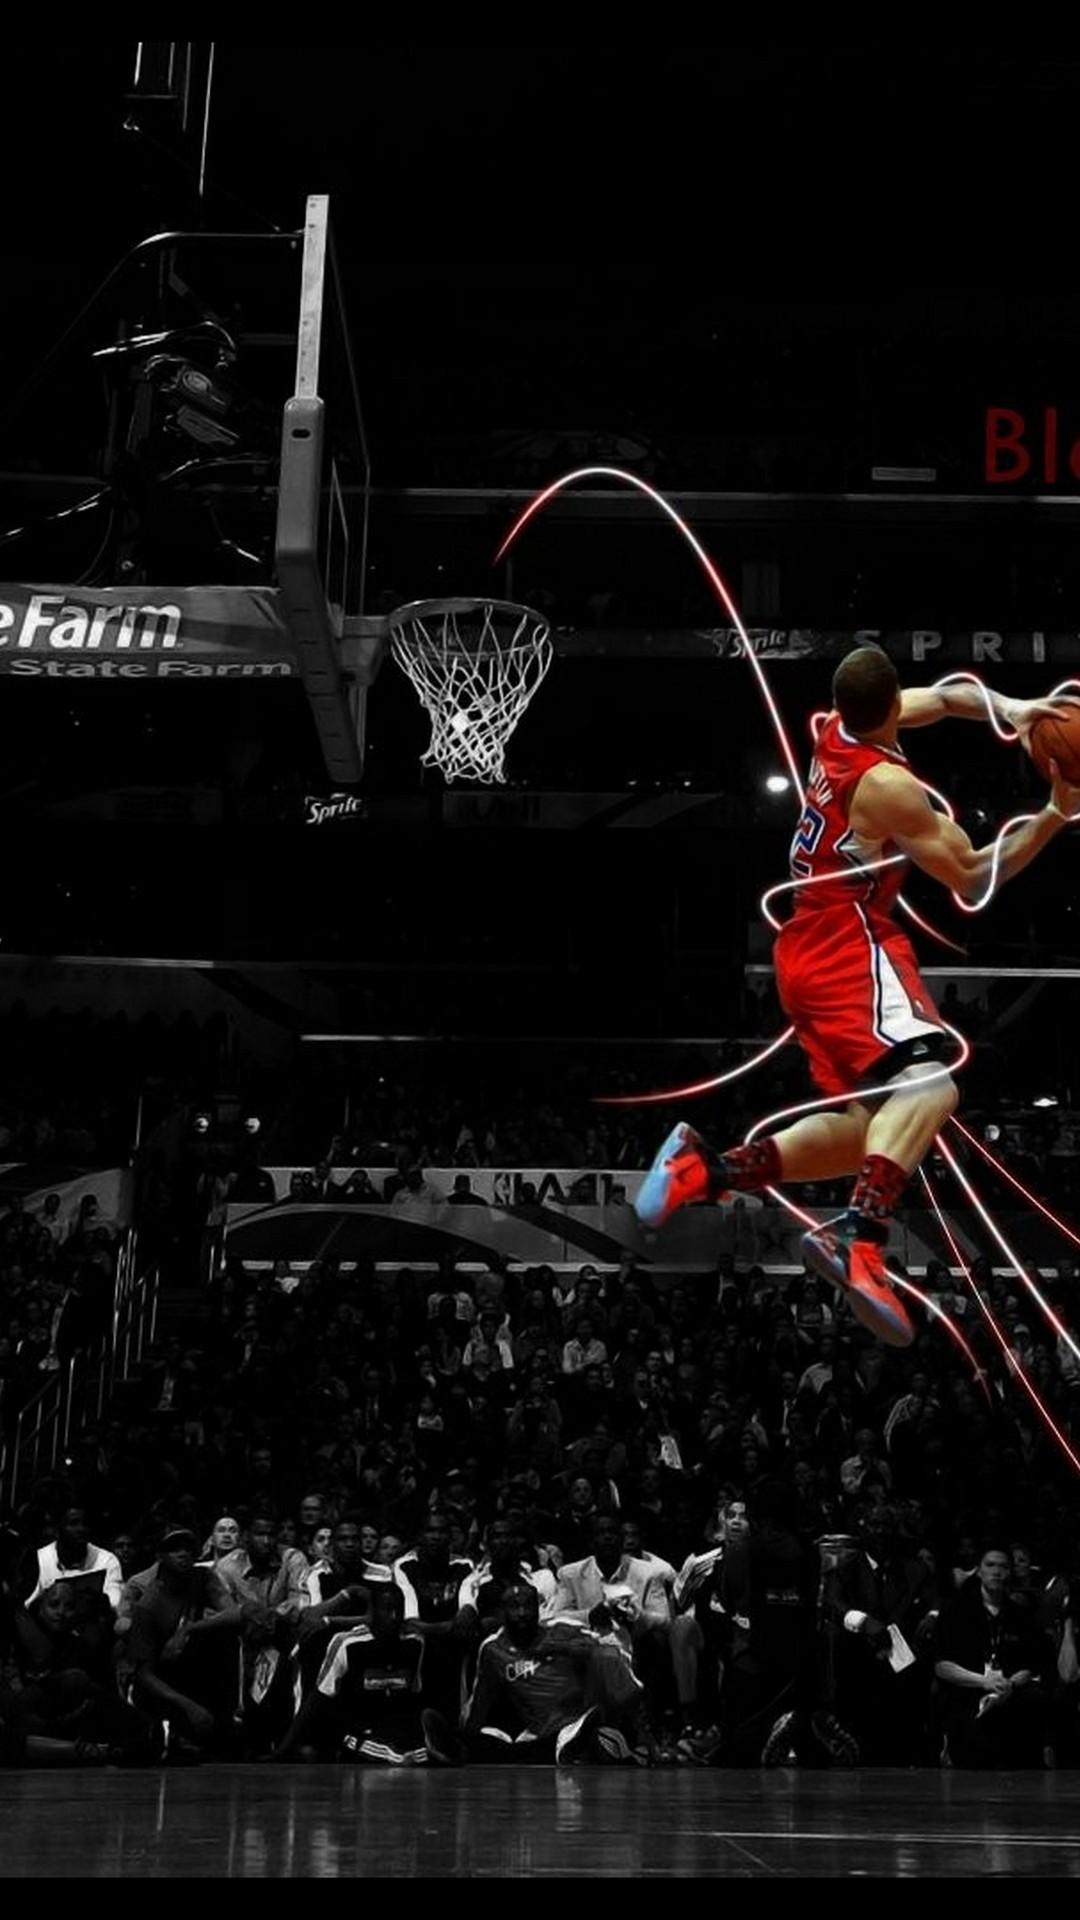 NBA Basketball iPhone 7 Plus Wallpaper 2020 Basketball Wallpaper 1080x1920